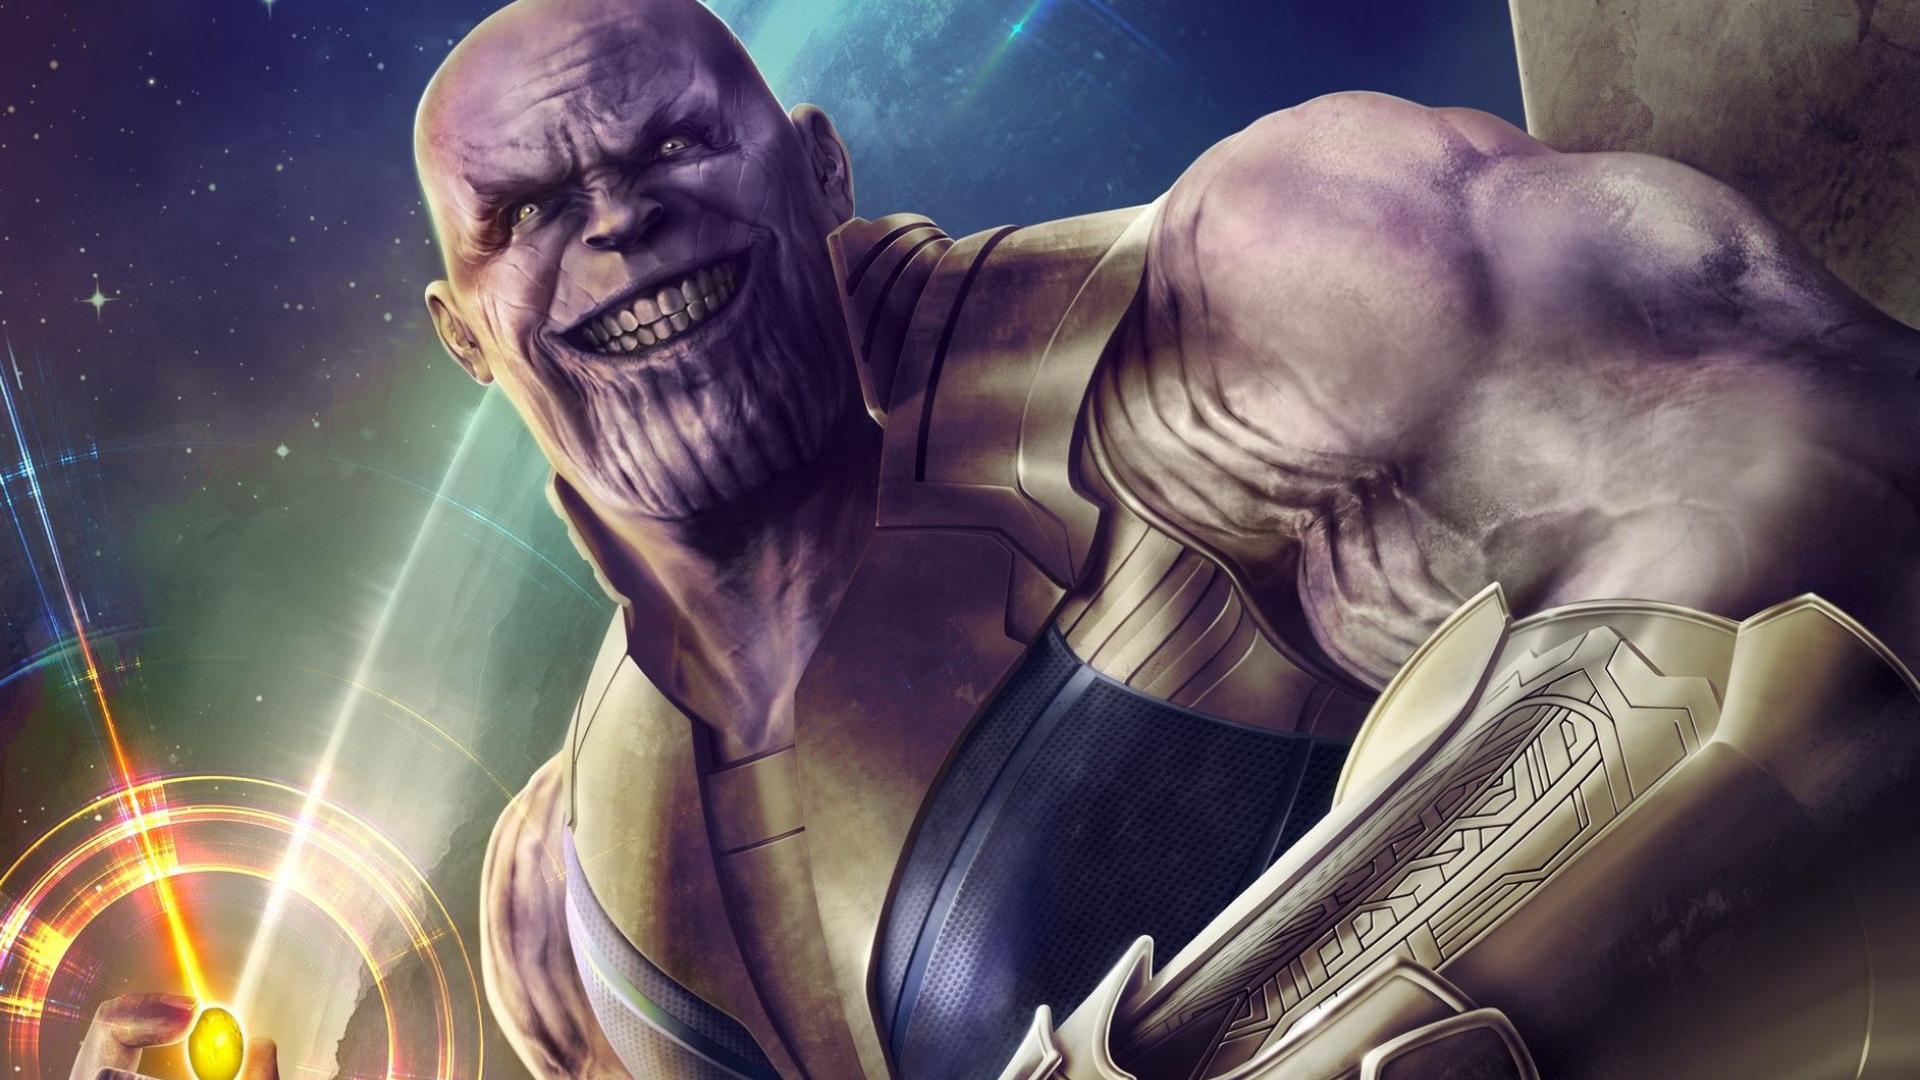 Thanos Infinity Stone Artwork, Full HD Wallpaper